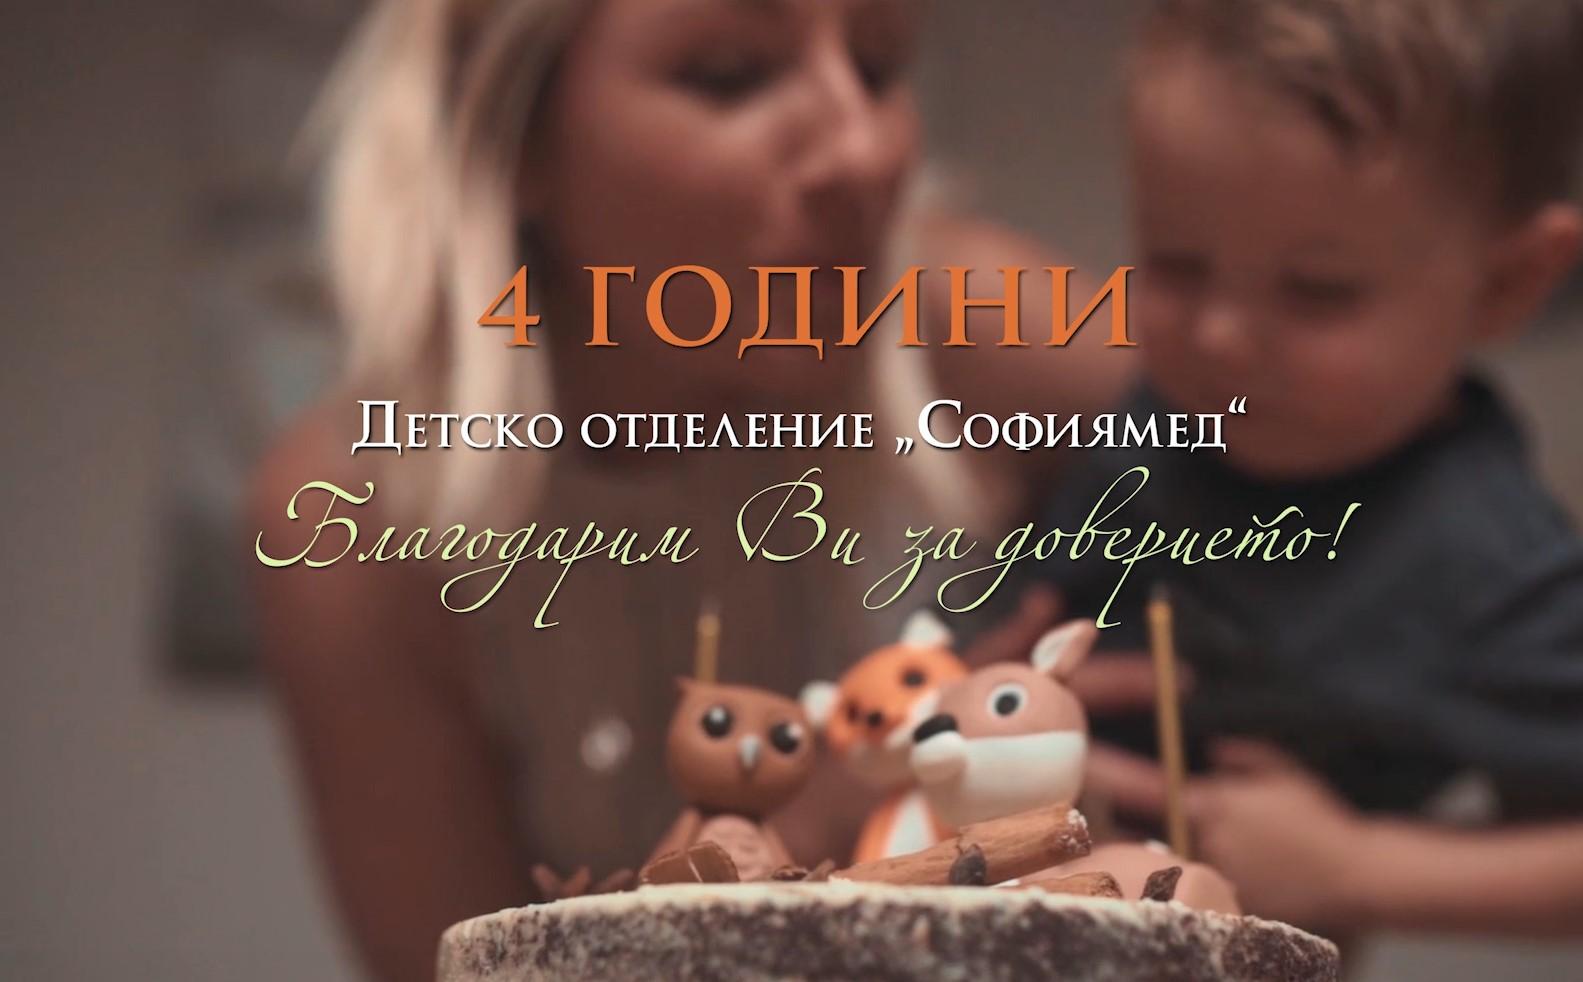 Честит 4-ти рожден ден на Детско отделение на УМБАЛ